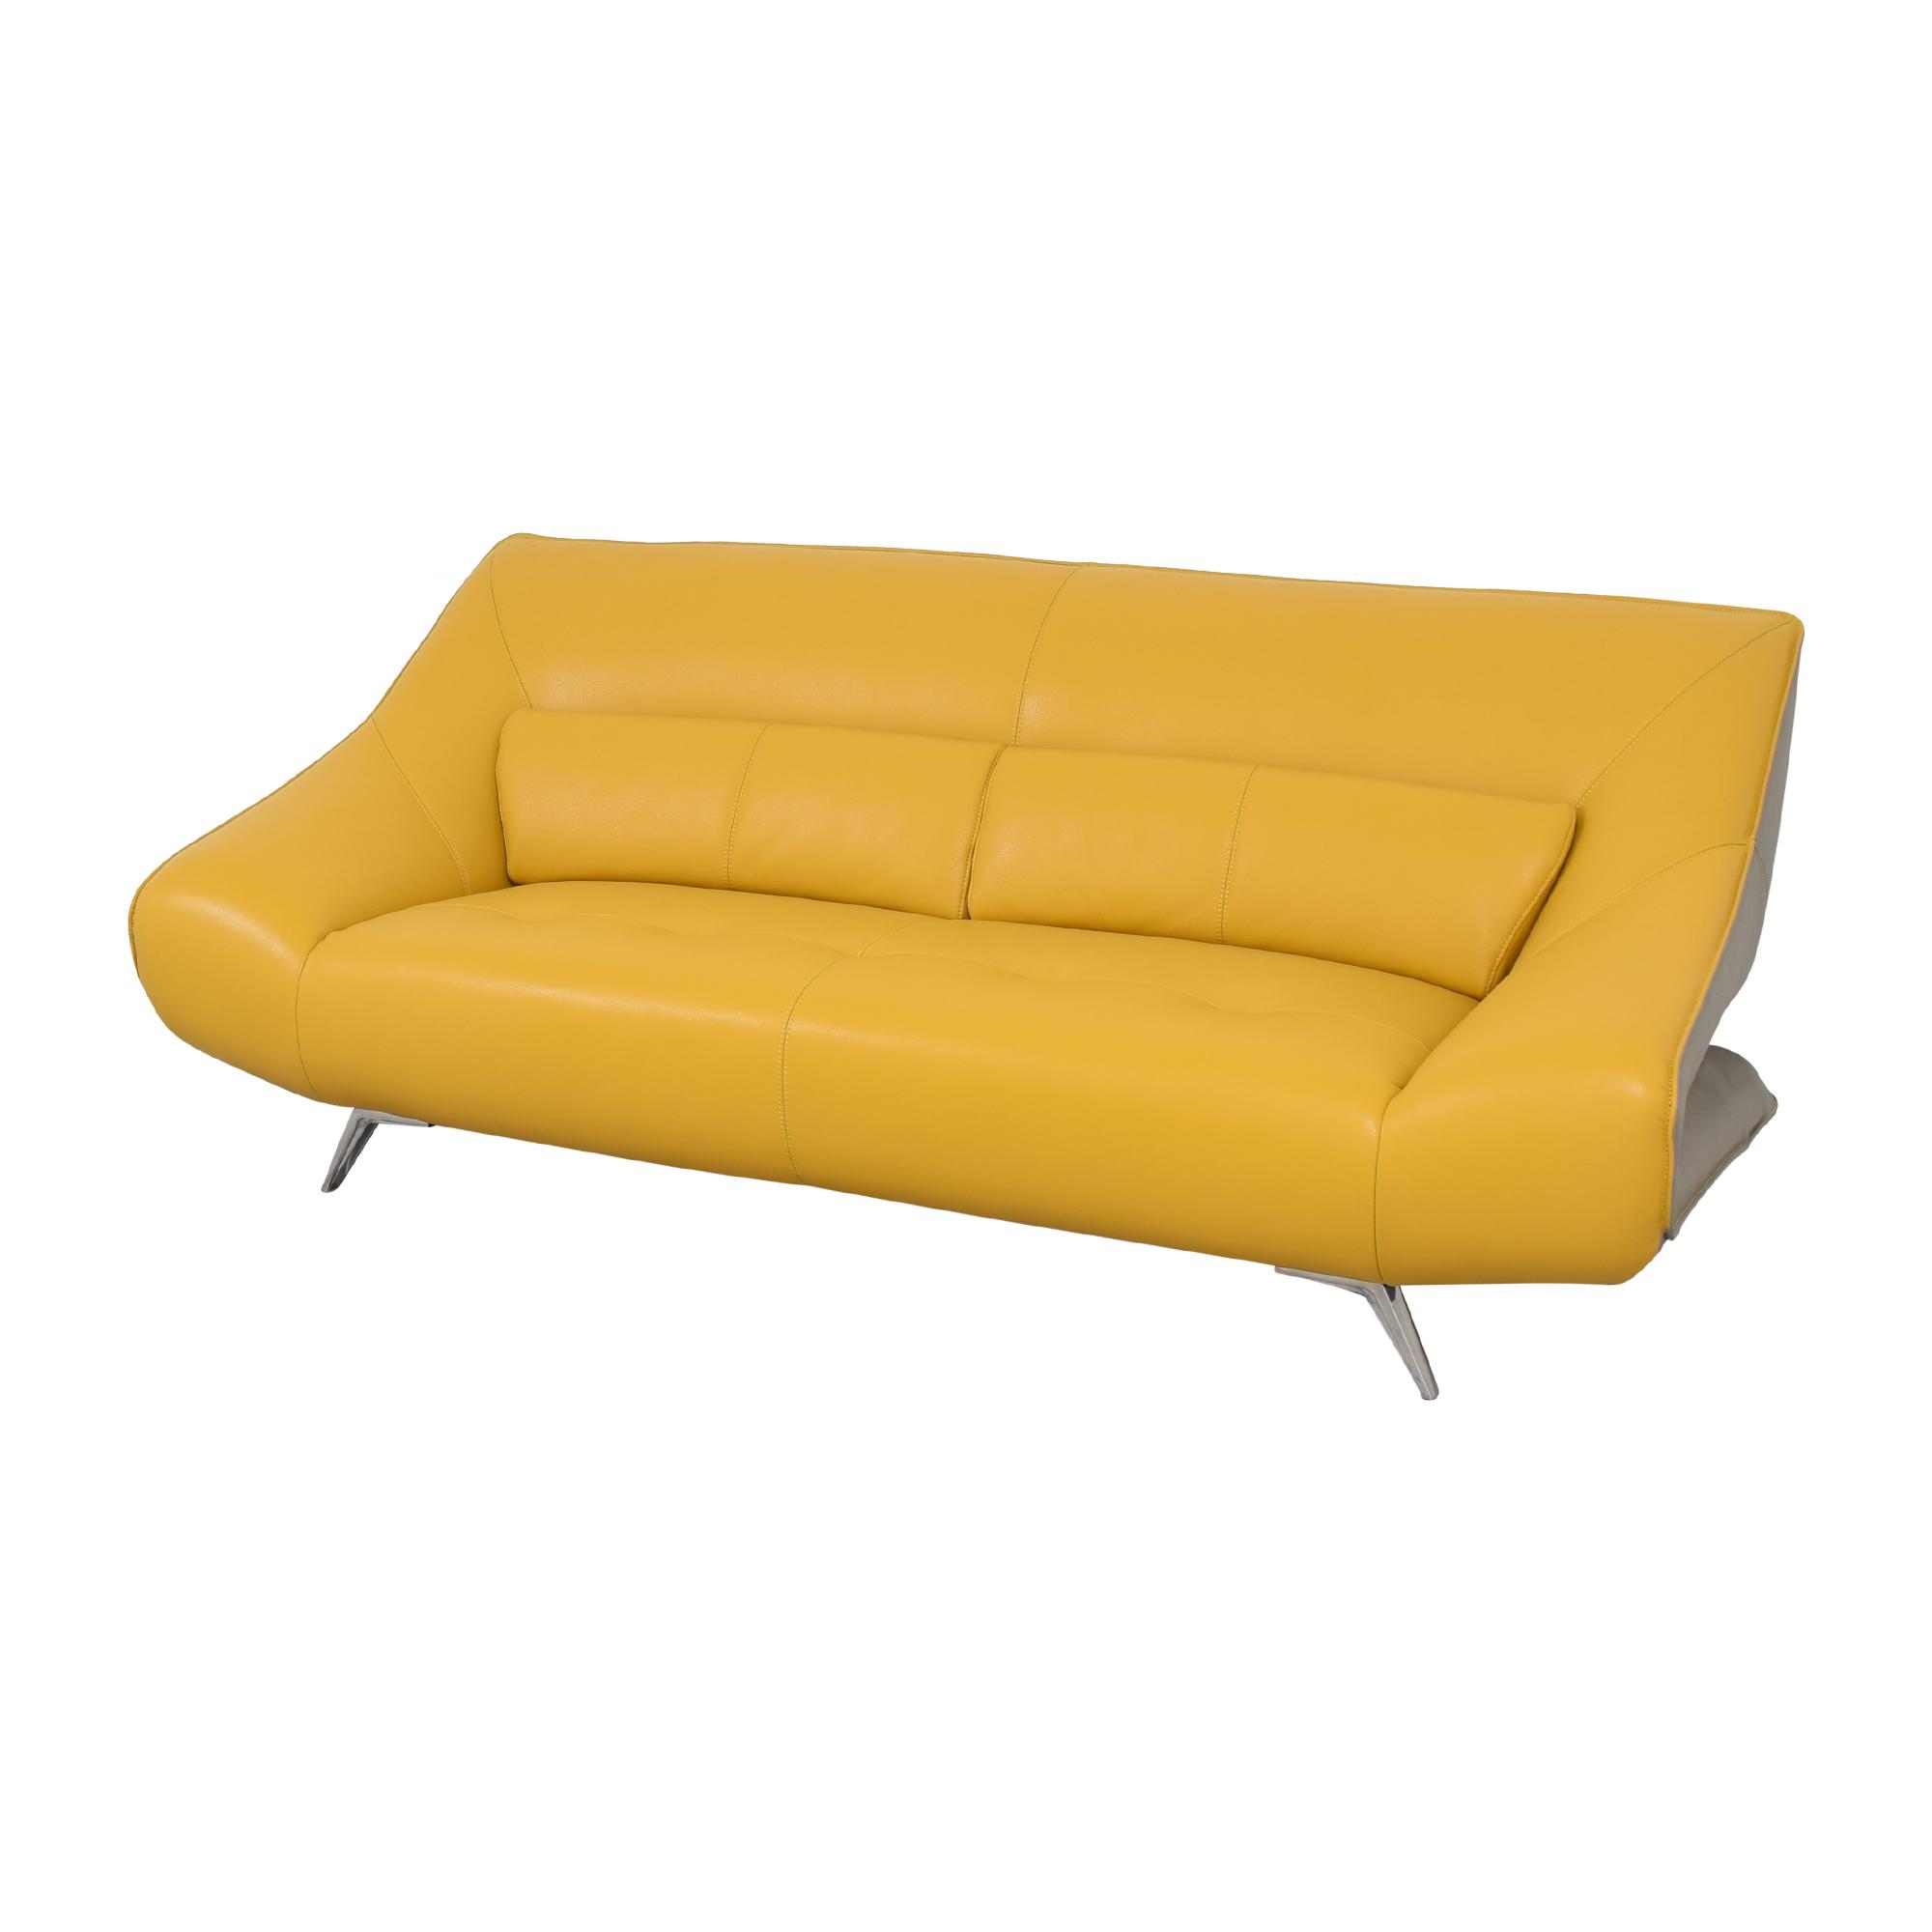 Creative Furniture Creative Furniture Madrid Modern Sofa coupon